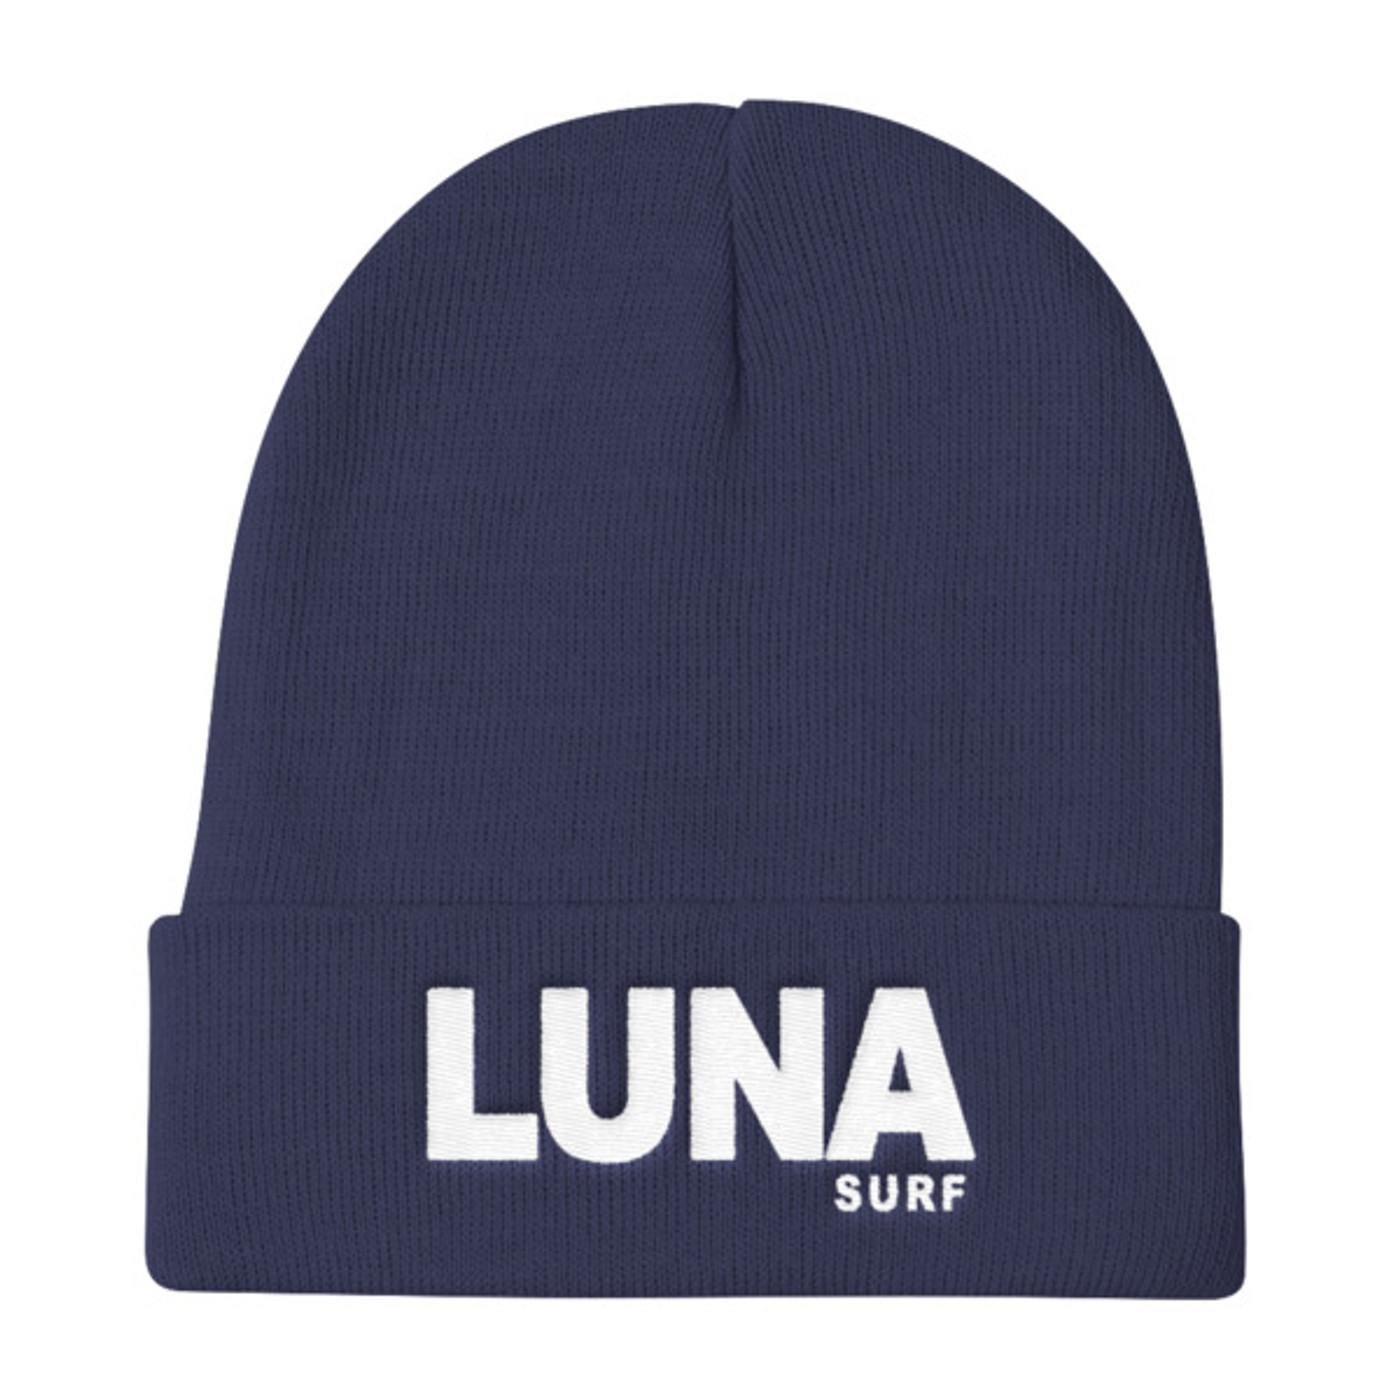 Luna logo White Knit Beanie